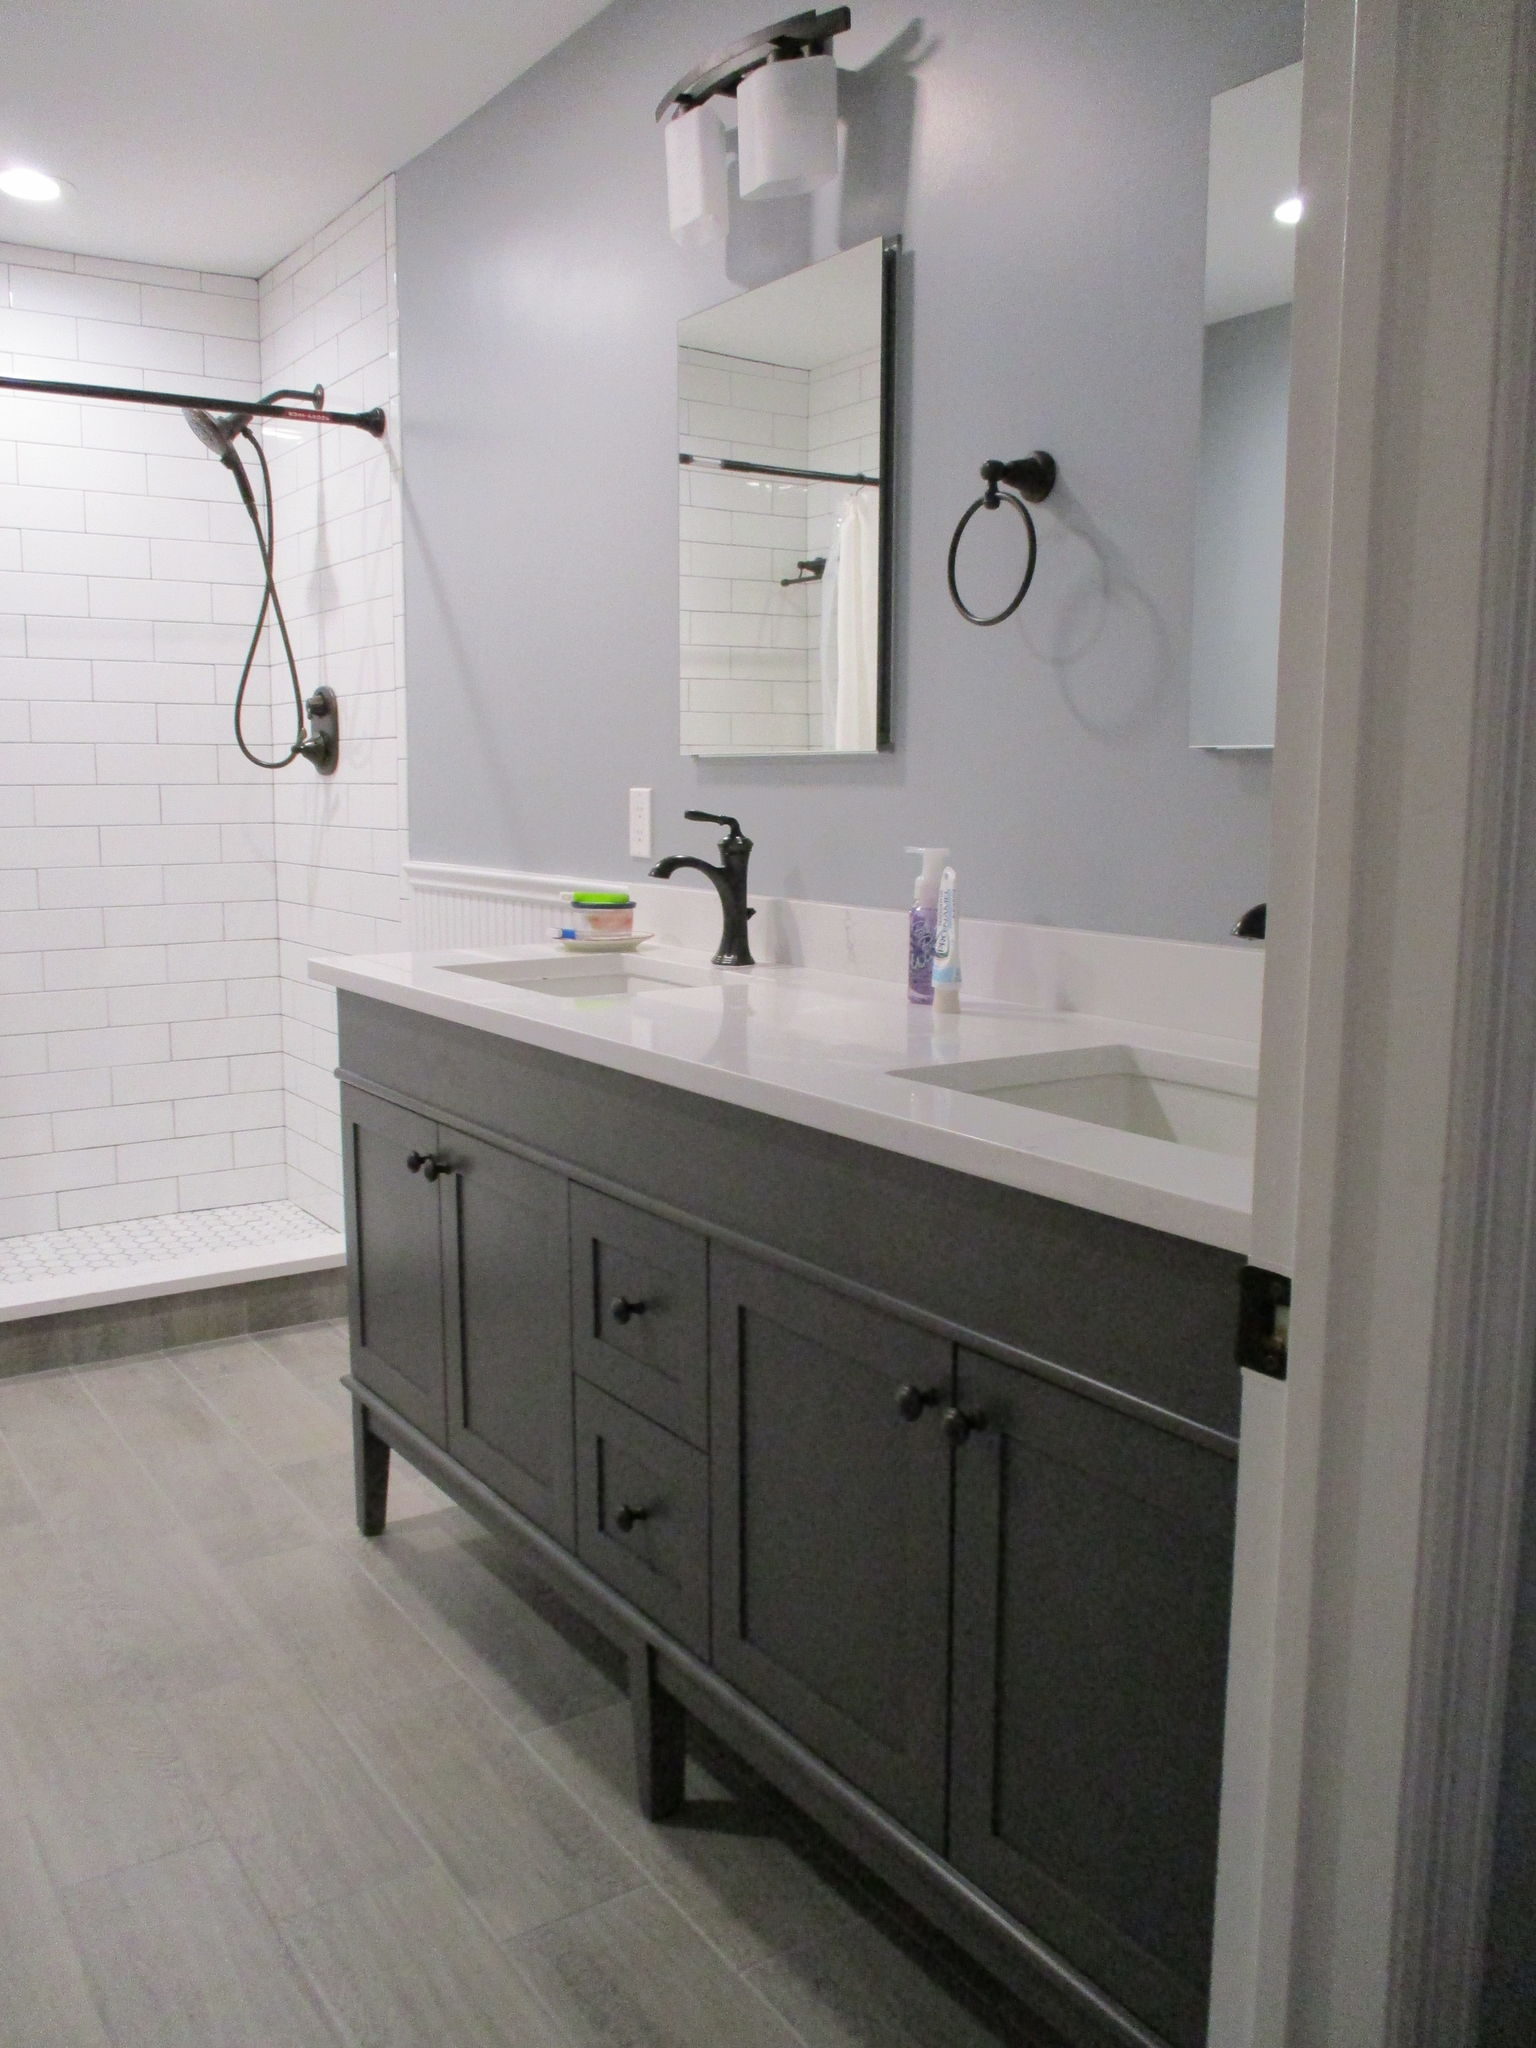 Bathroom Renovations Connecticut Bathroom Remodel Ideas